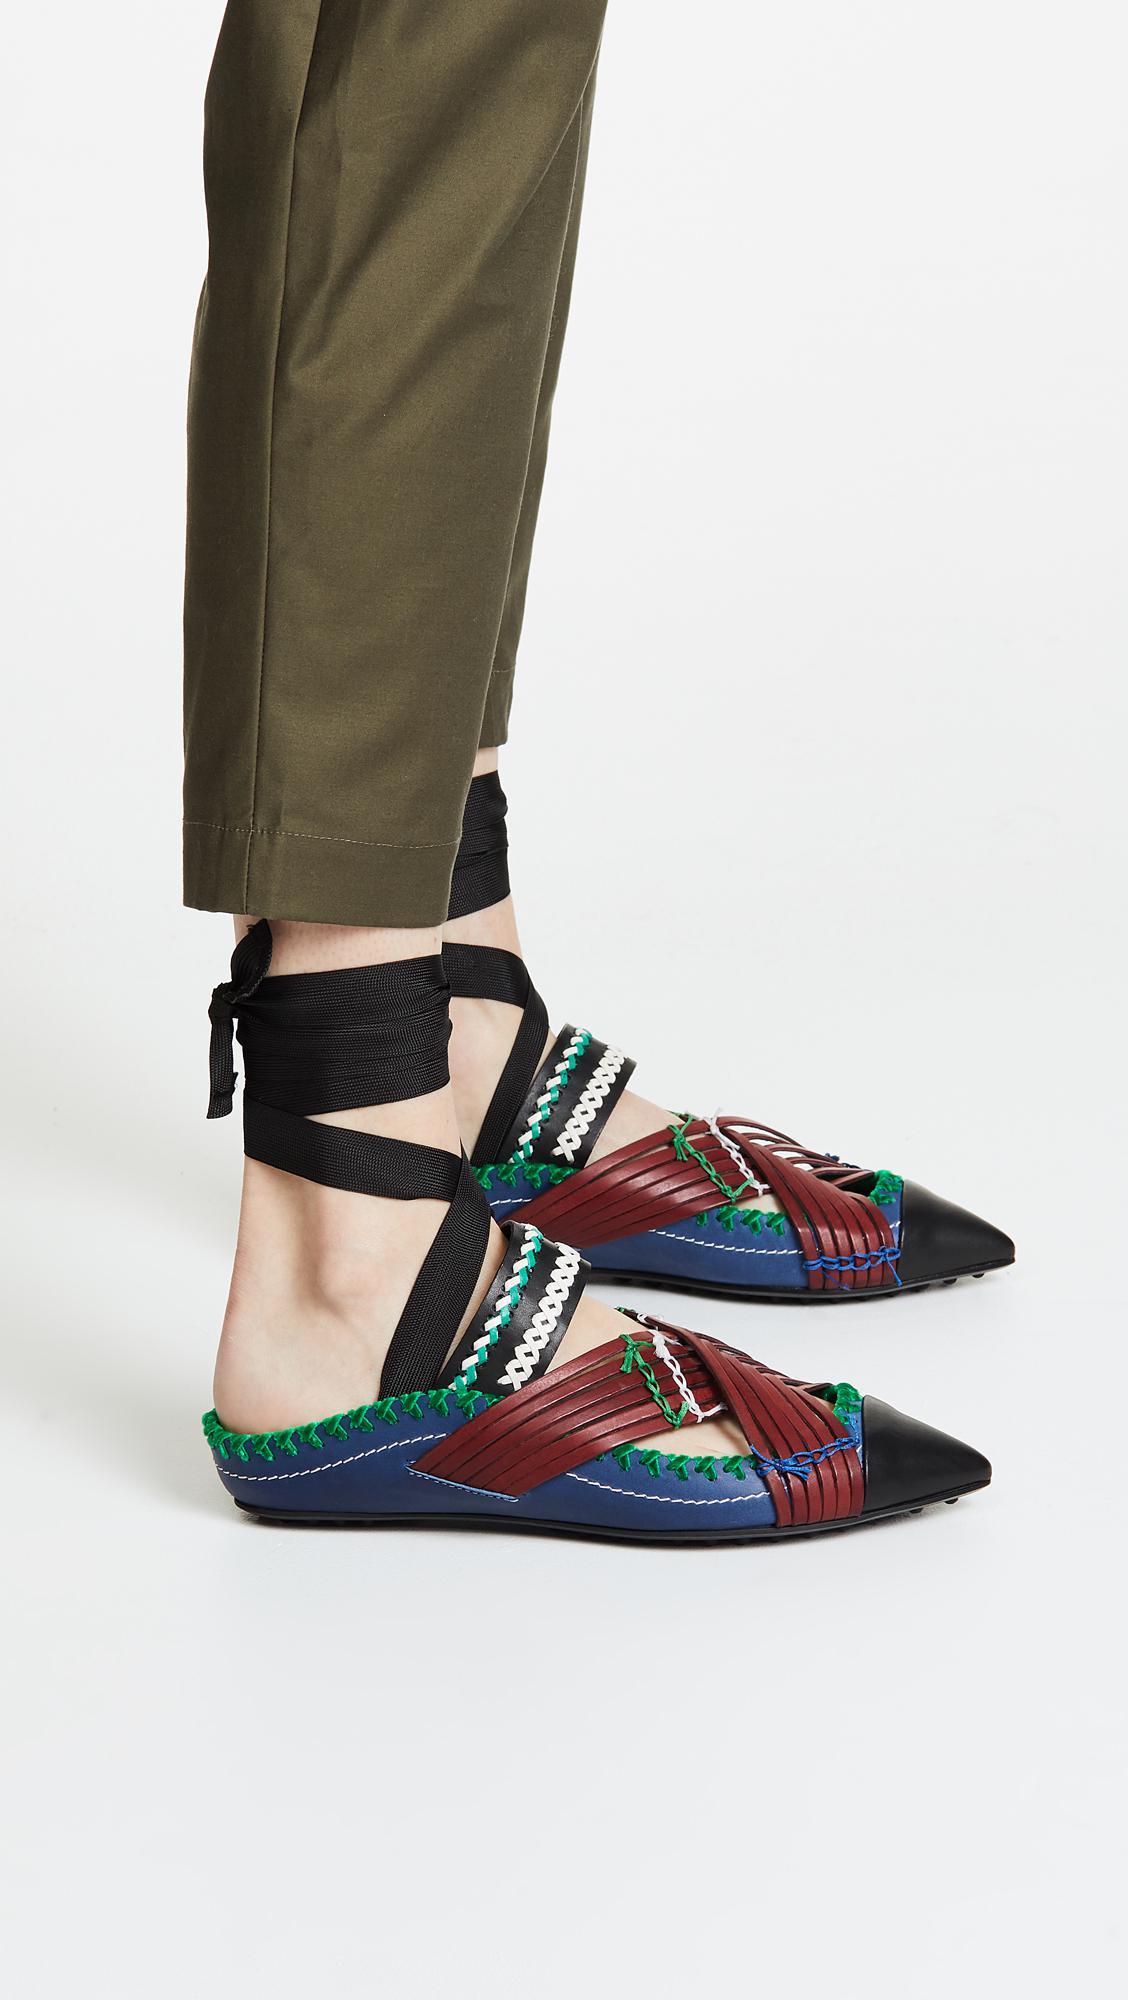 Berri Open Toe Sandals Carven 4qj6y3TDgZ